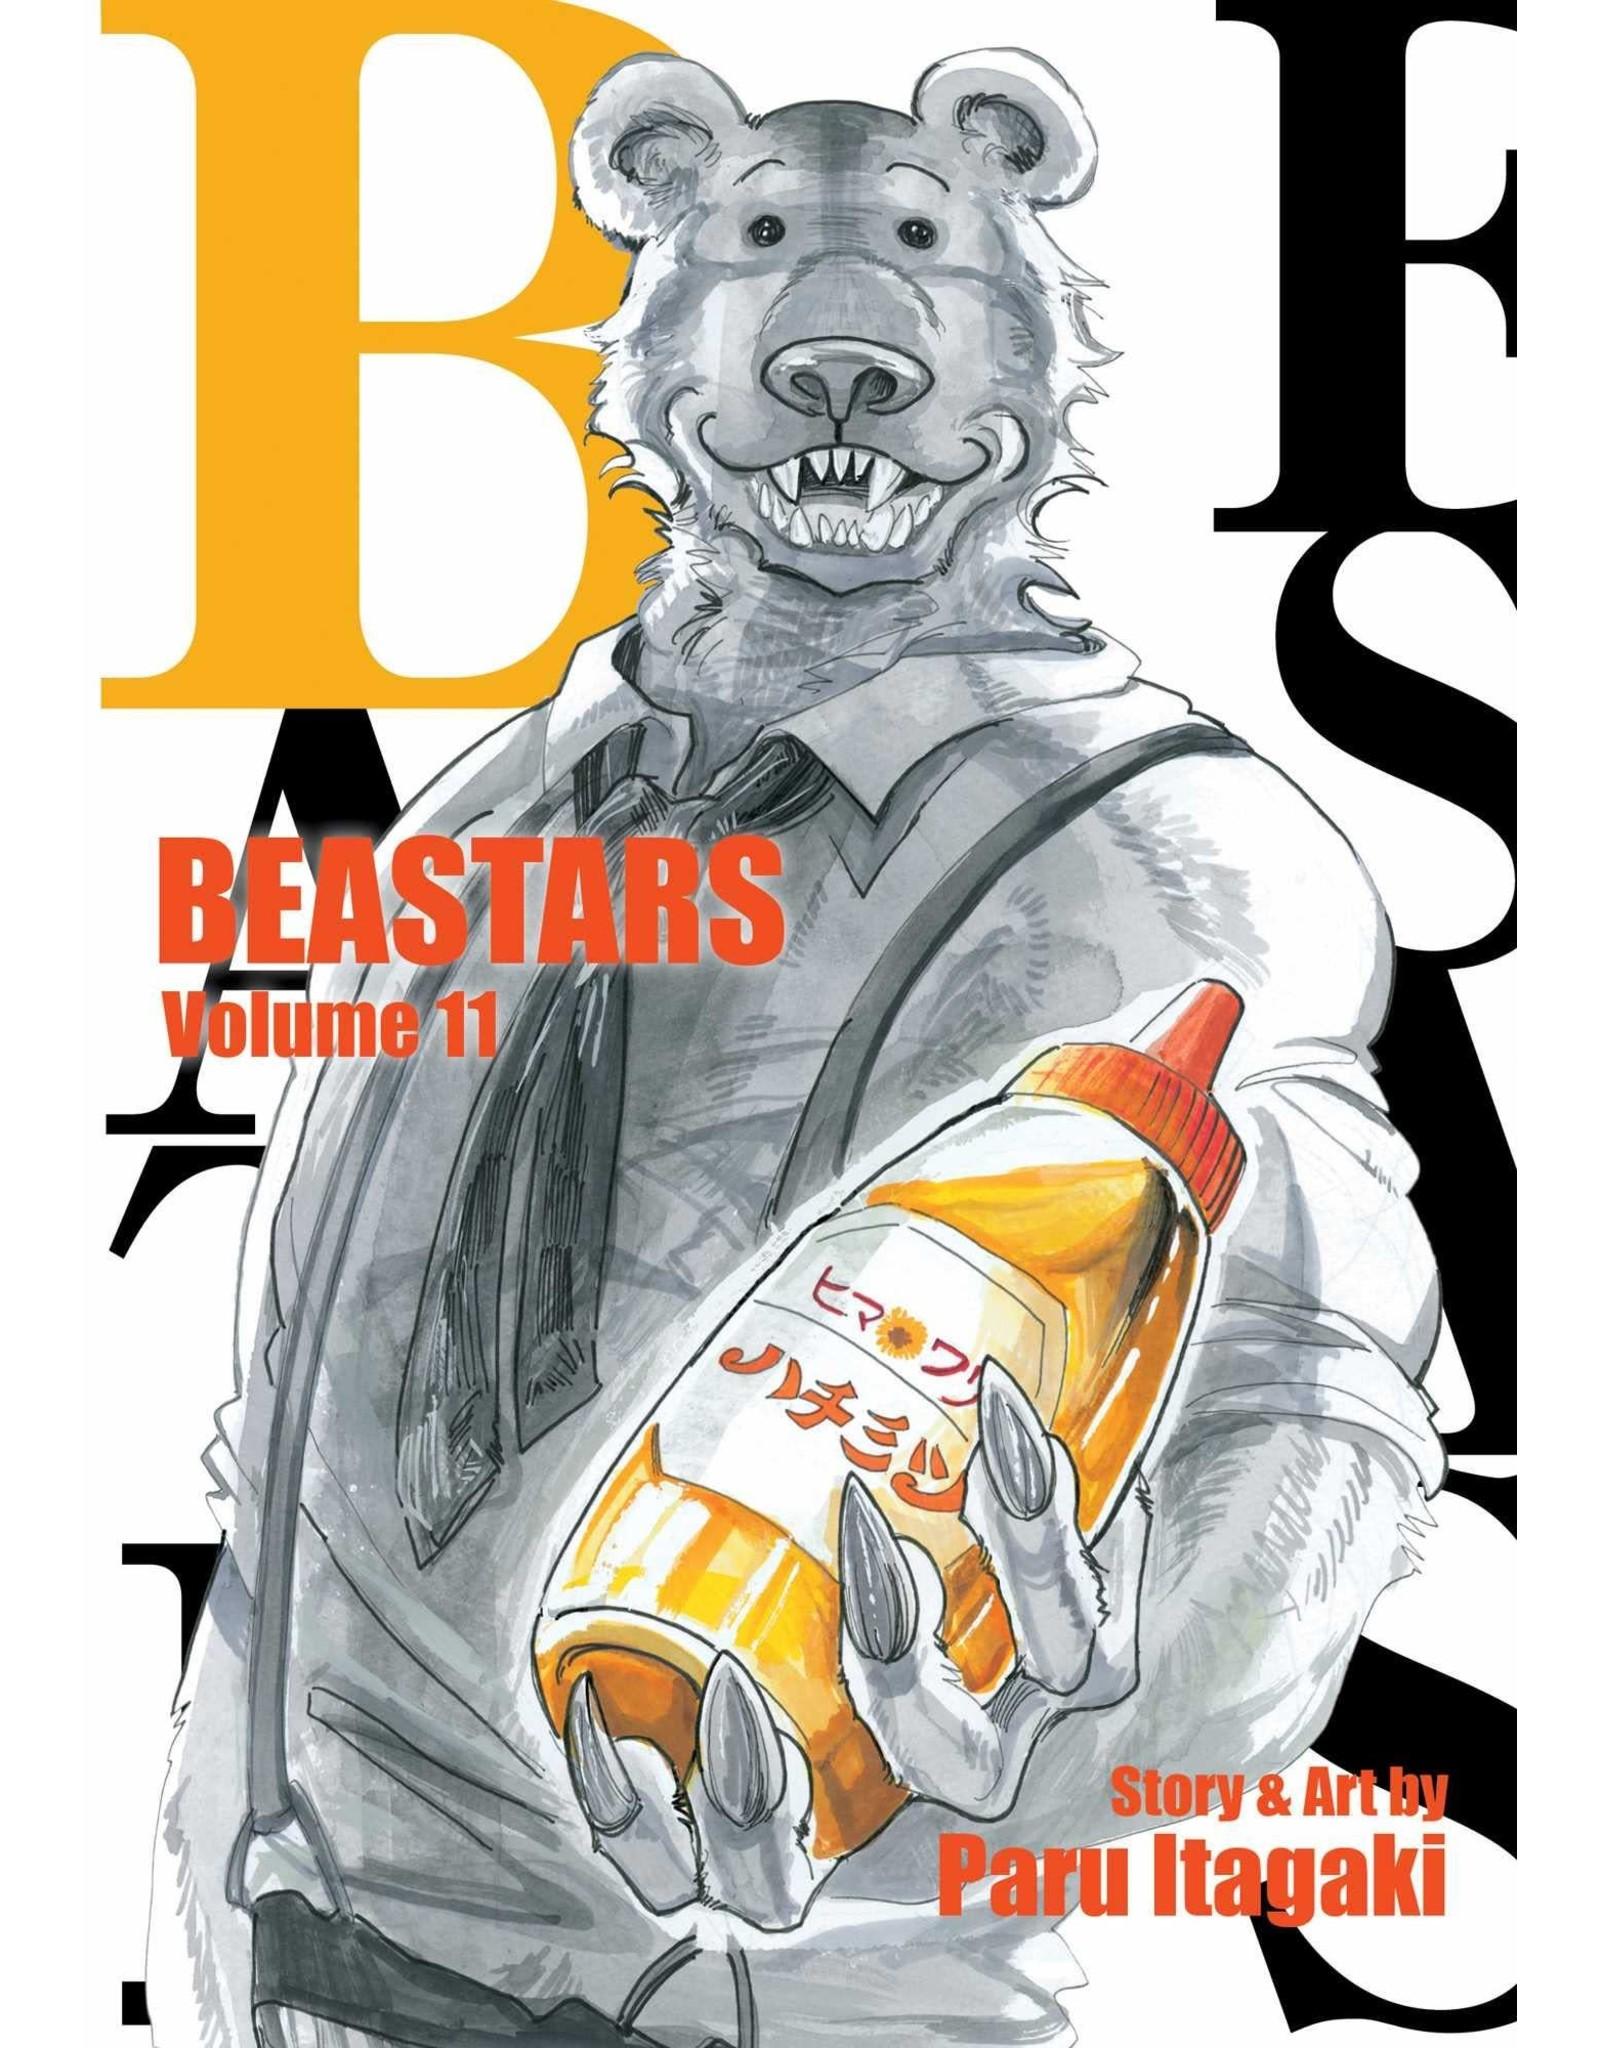 Beastars 11 (English)